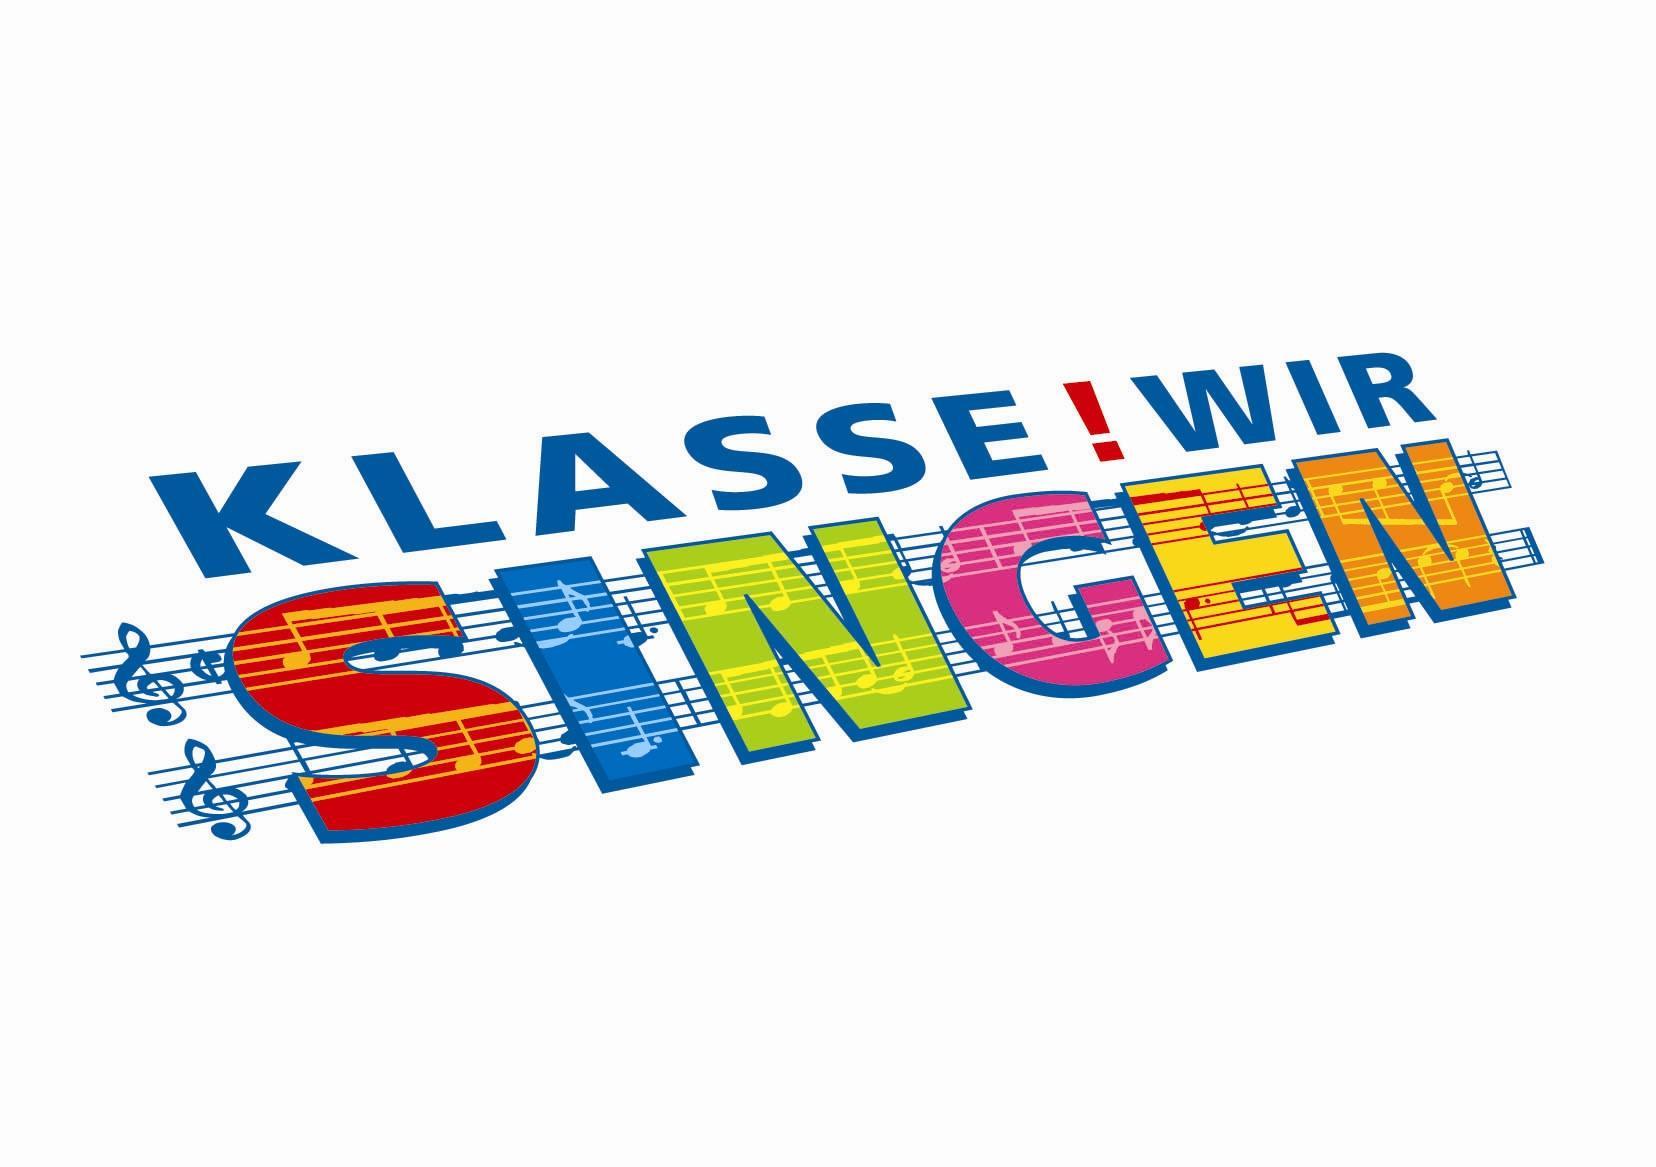 http://www.auftakte.de/wp-content/uploads/Klasse-singen.jpg